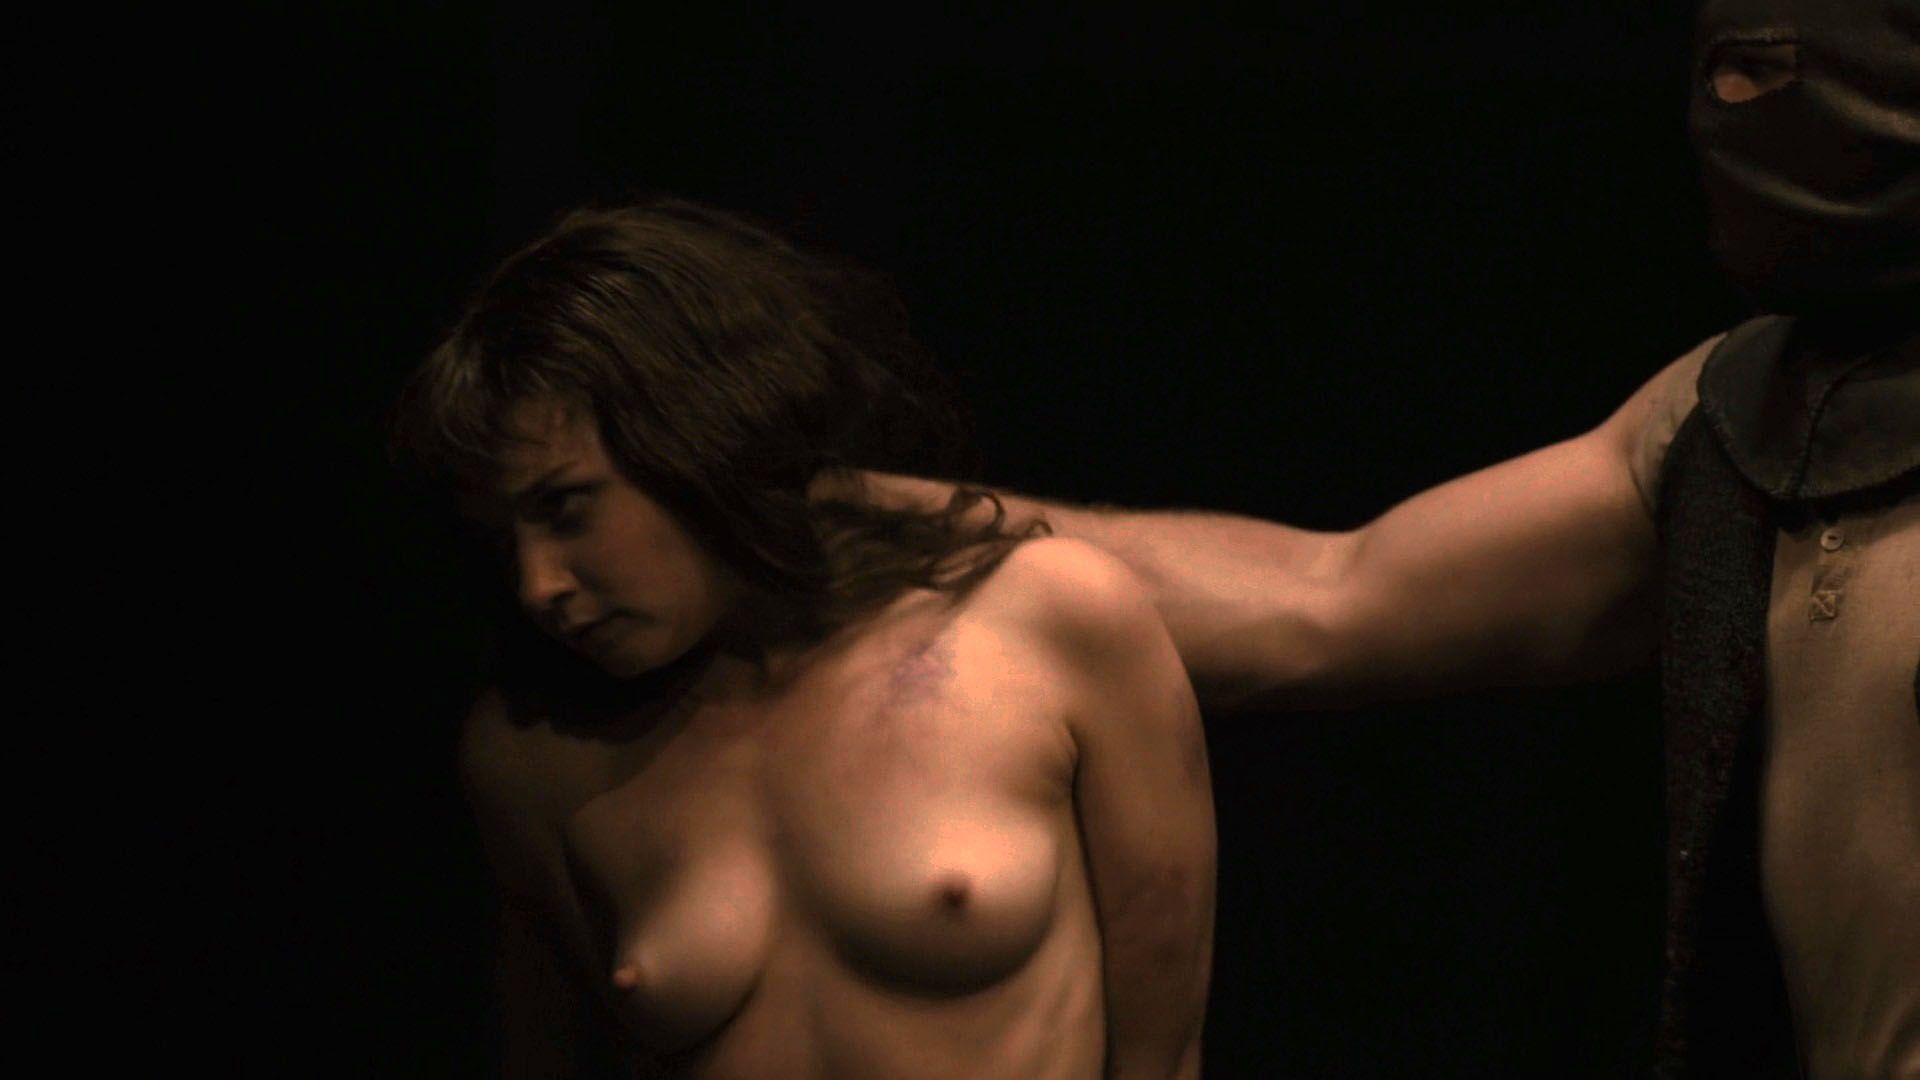 Jessica-Barden-Nude-1